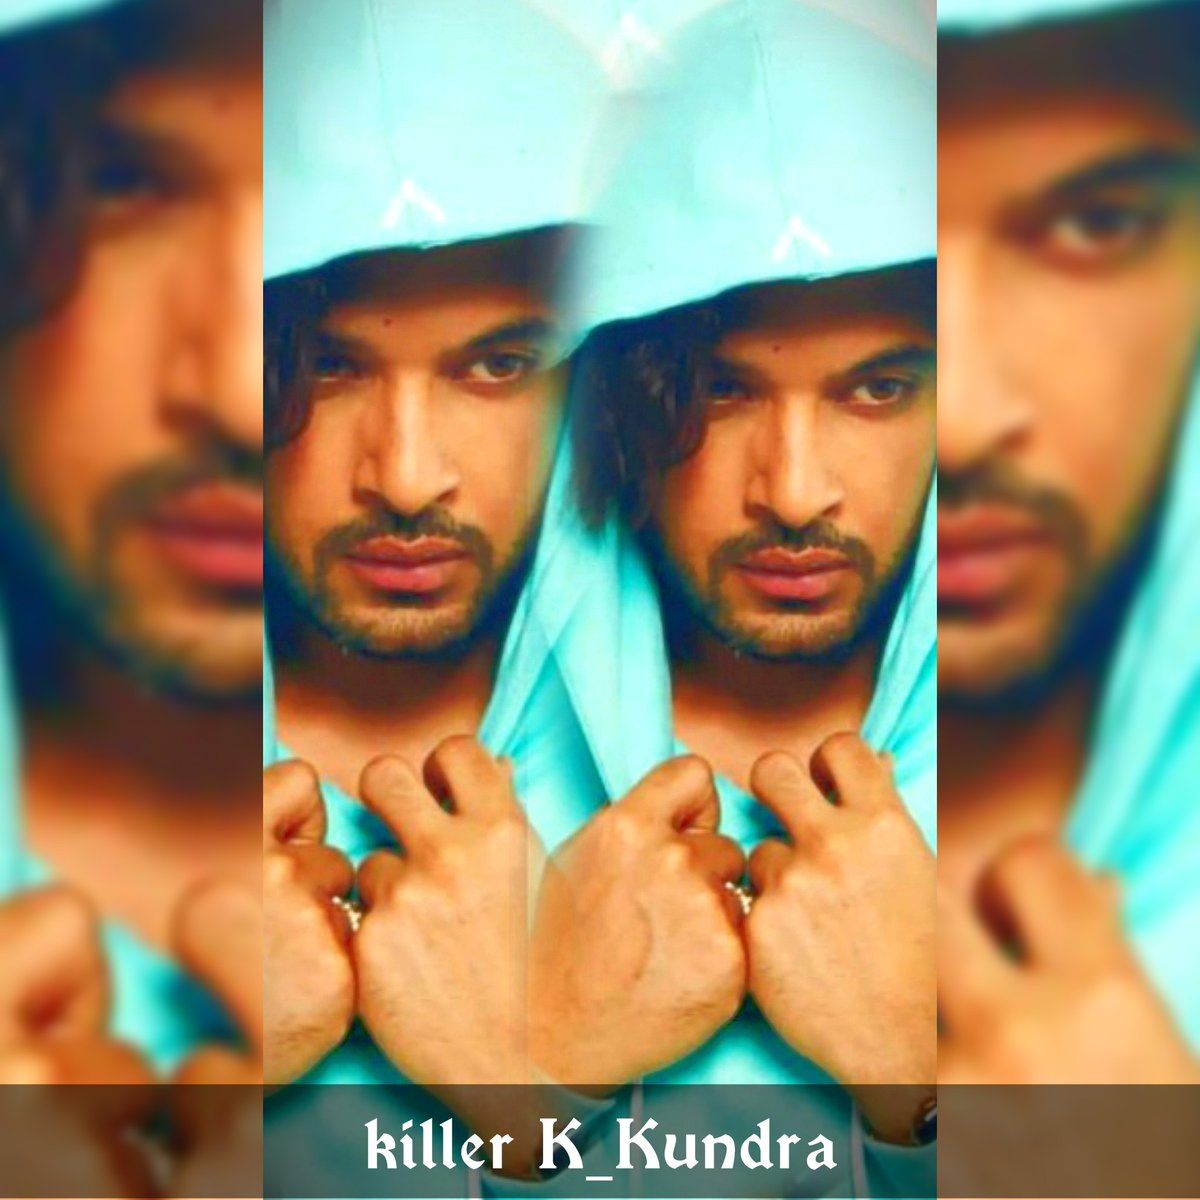 Always Remember That You Are Absolutely Unique🔥🔥🔥🔥 @kkundrra  #kk #KaranKundrra #kitnimohabbathai #yahkahanaagayhum #ithappenedinkolkata #fanaah #roadies #dilhitohhai #handsome #hoty #dashing #cool #cute #charming